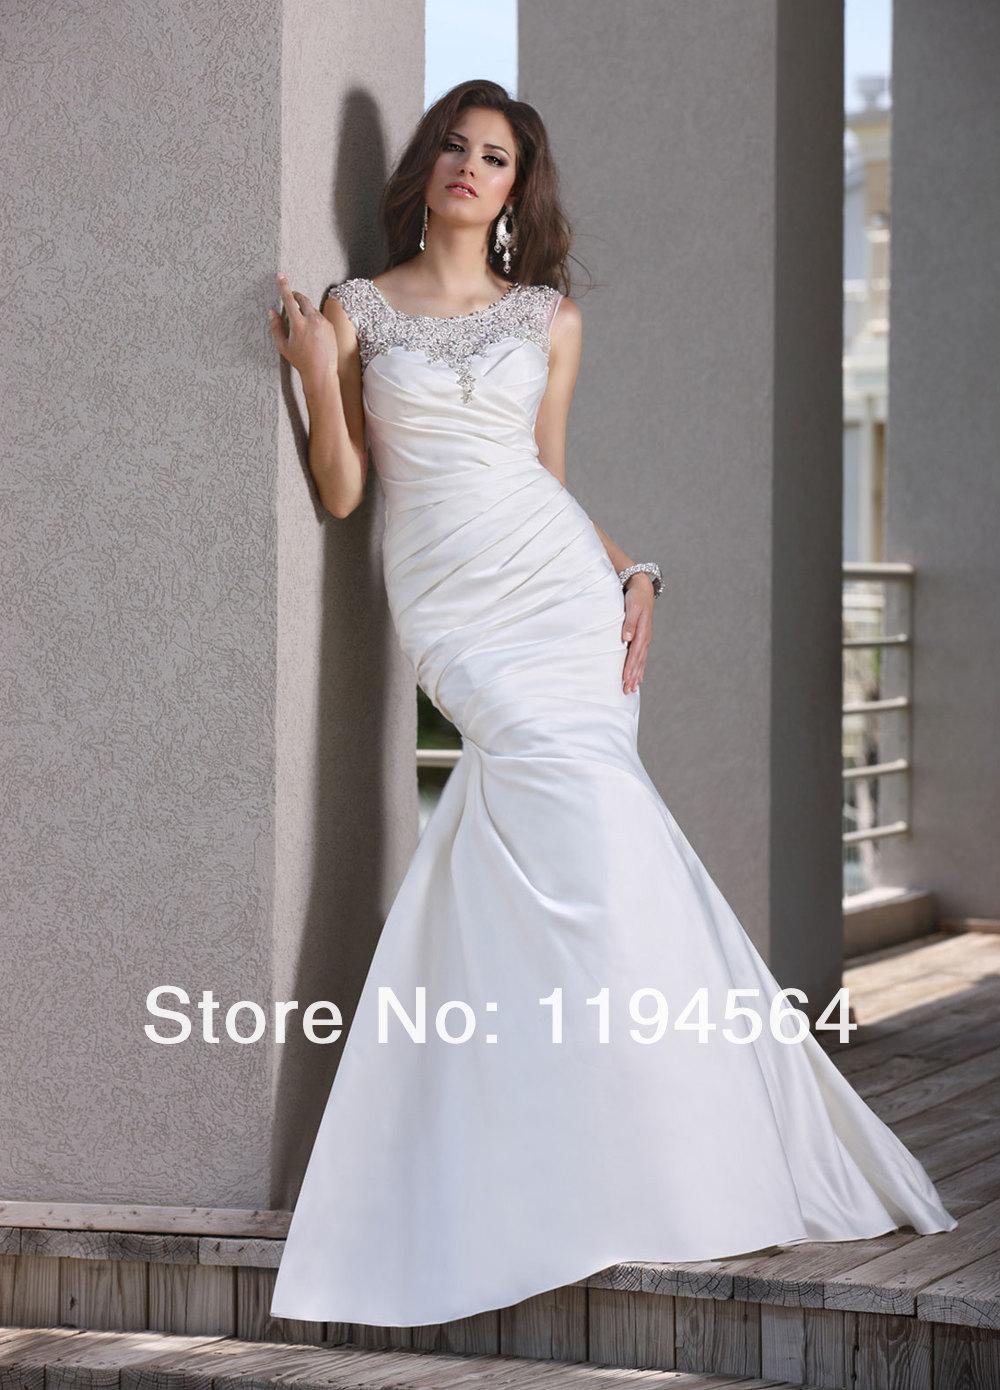 Appliques and Beaded See Through Wedding Reception Dress Fashion 2014 White  Mermaid Taffeta Bridal Gowns Free Shipping WH1298 . ... 67adbc3f5b78